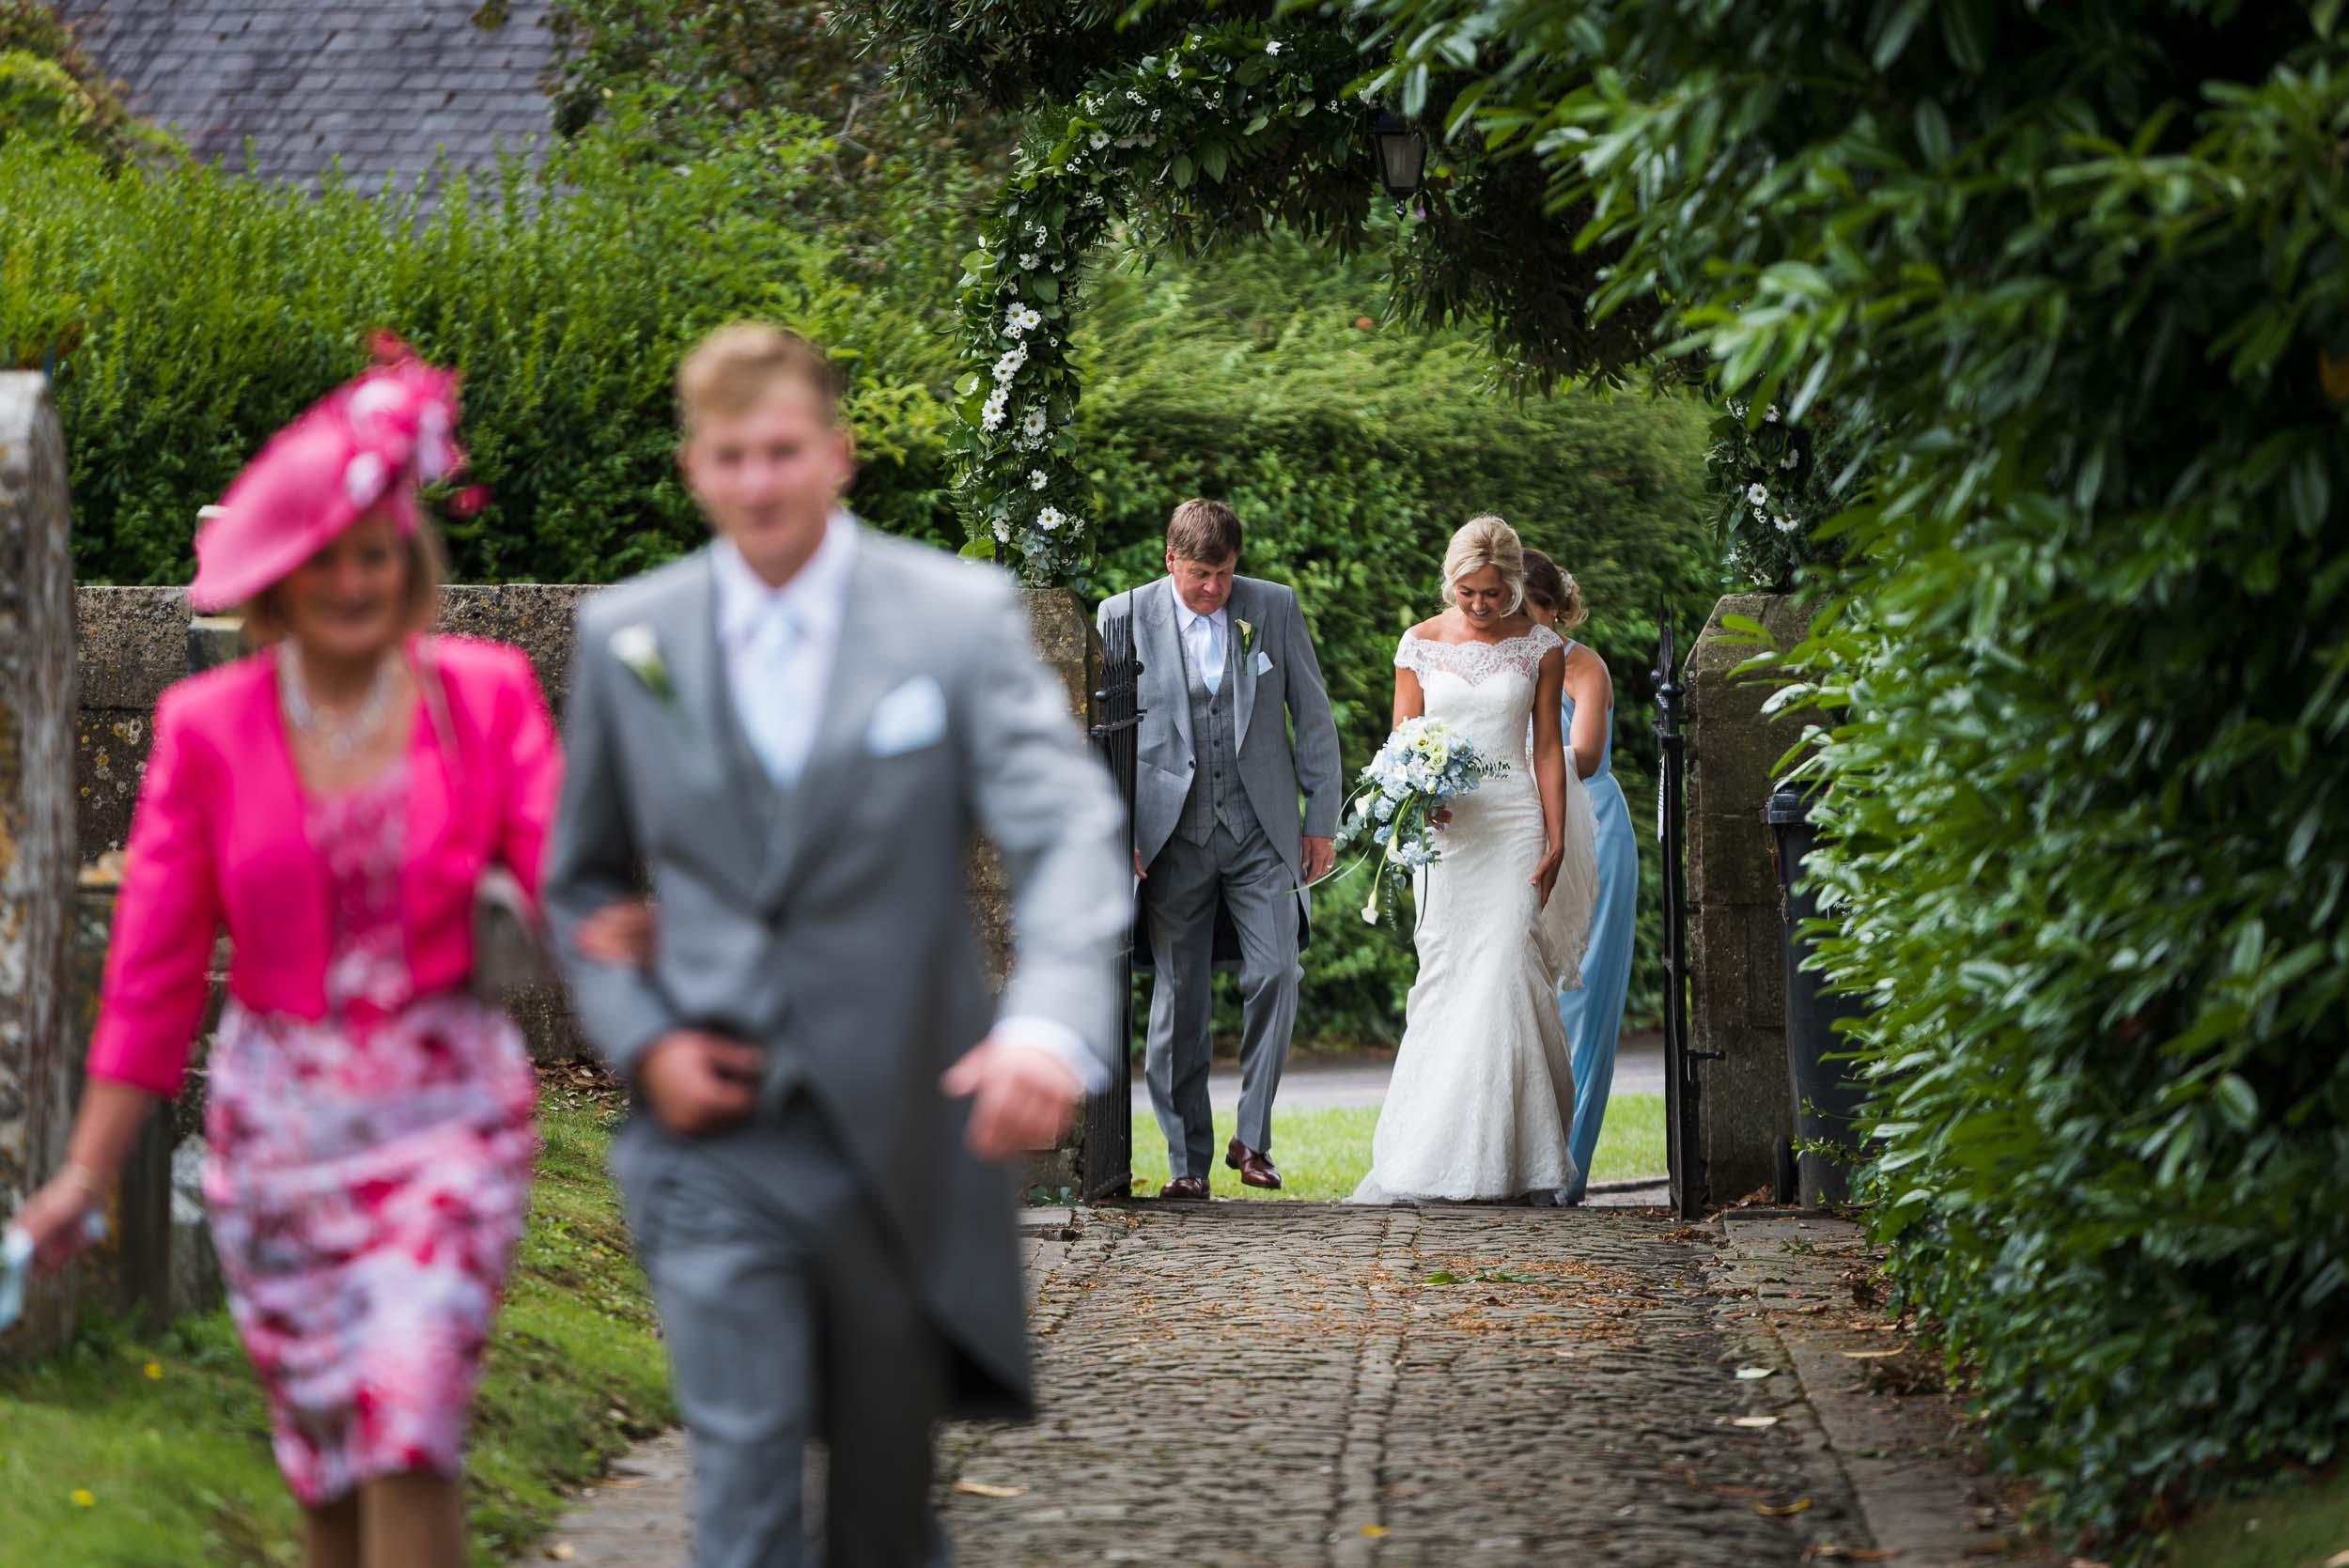 NC-20170722-sophie-and-jonny-wedding-0142.jpg